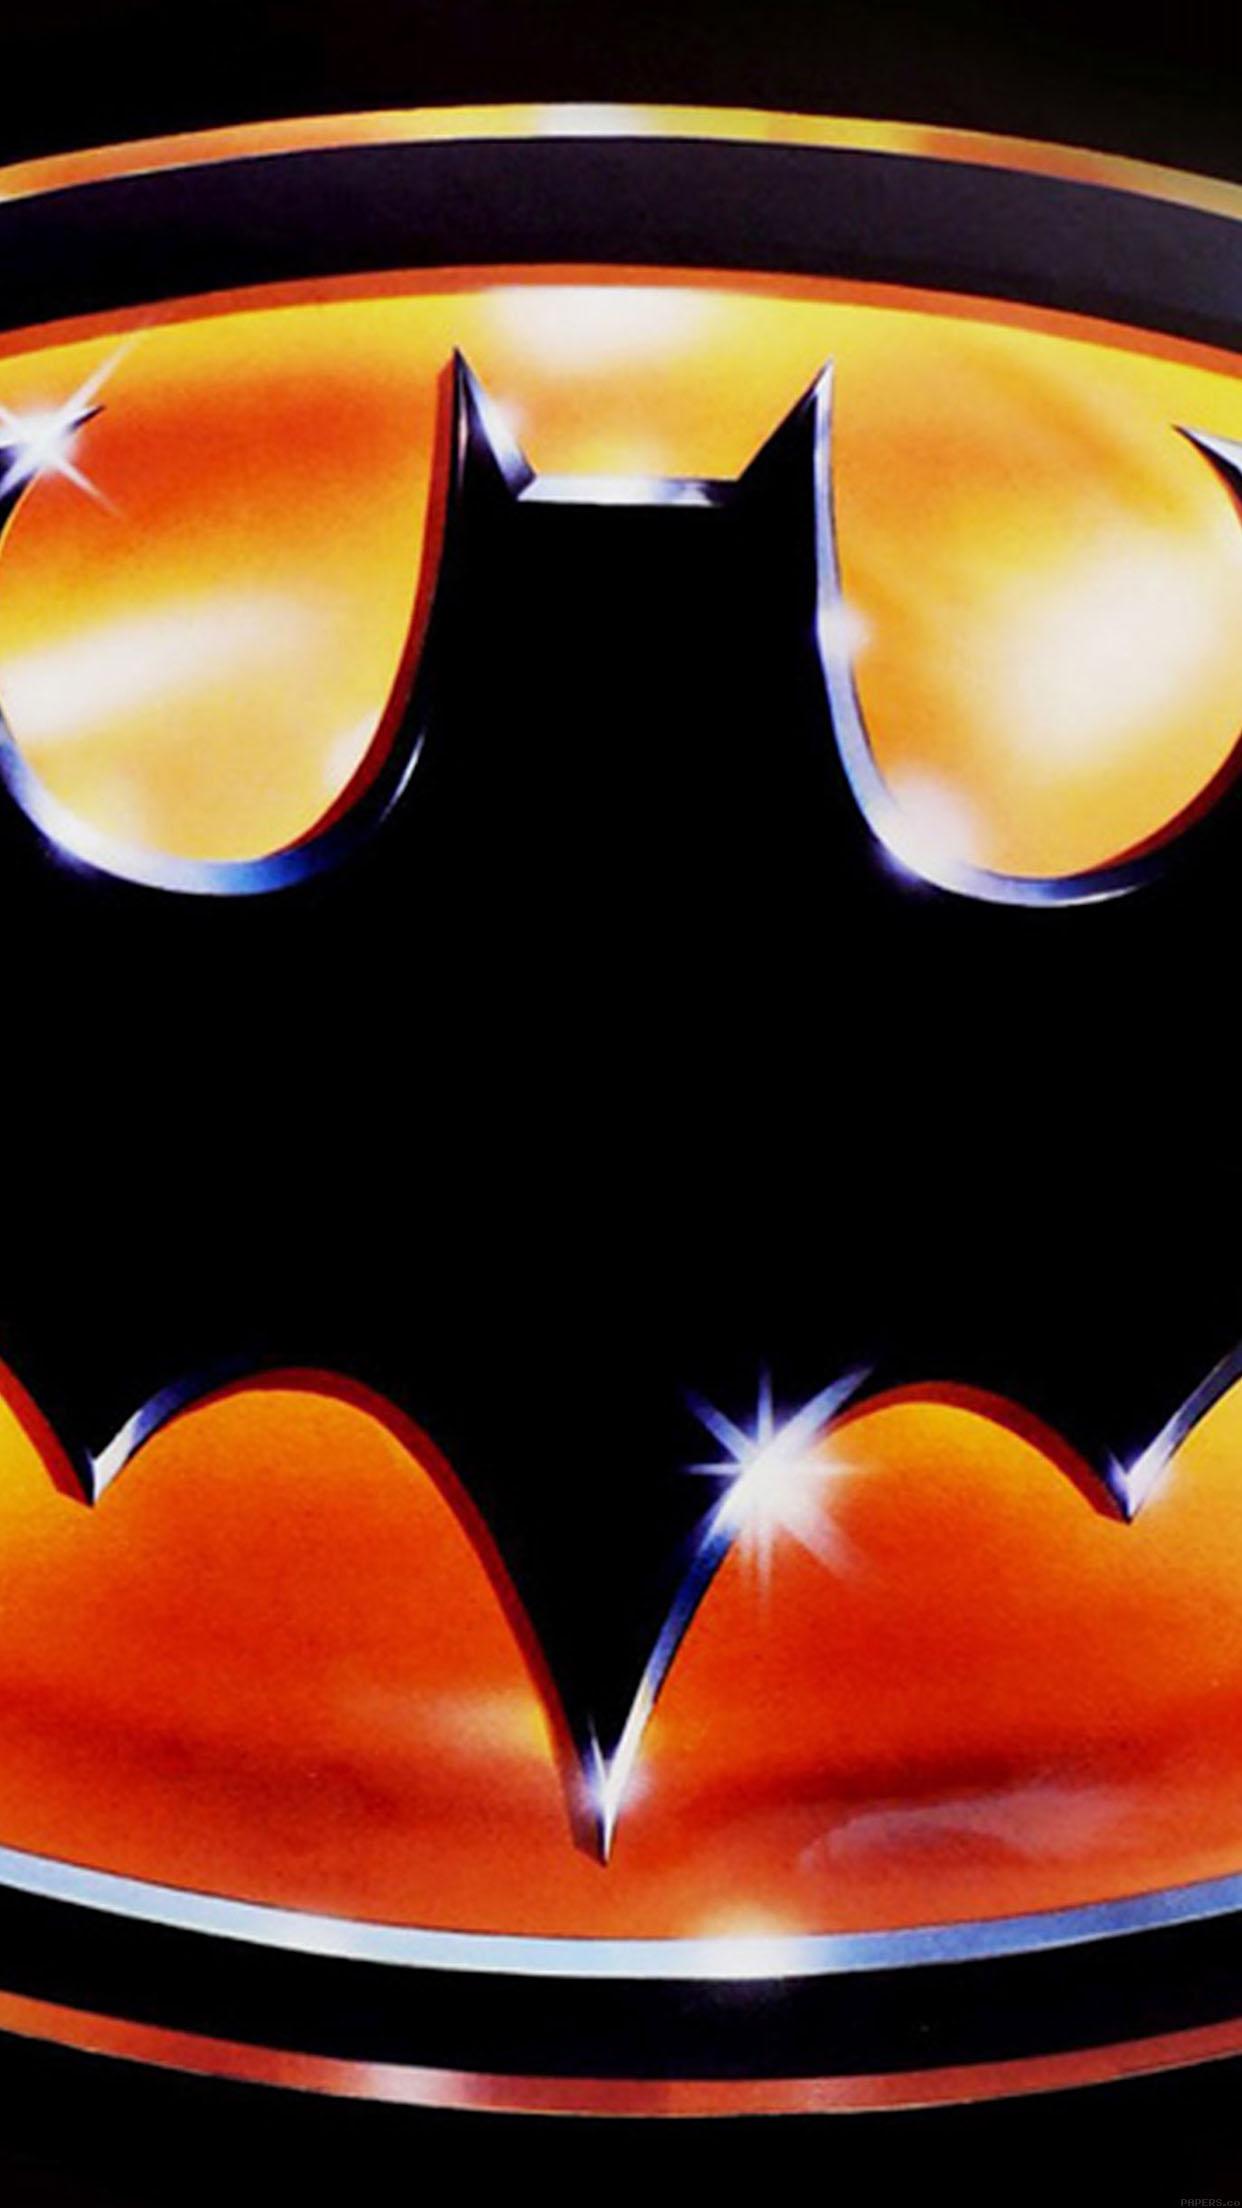 aa90-wallpaper-batman-20s-logo - Papers.co